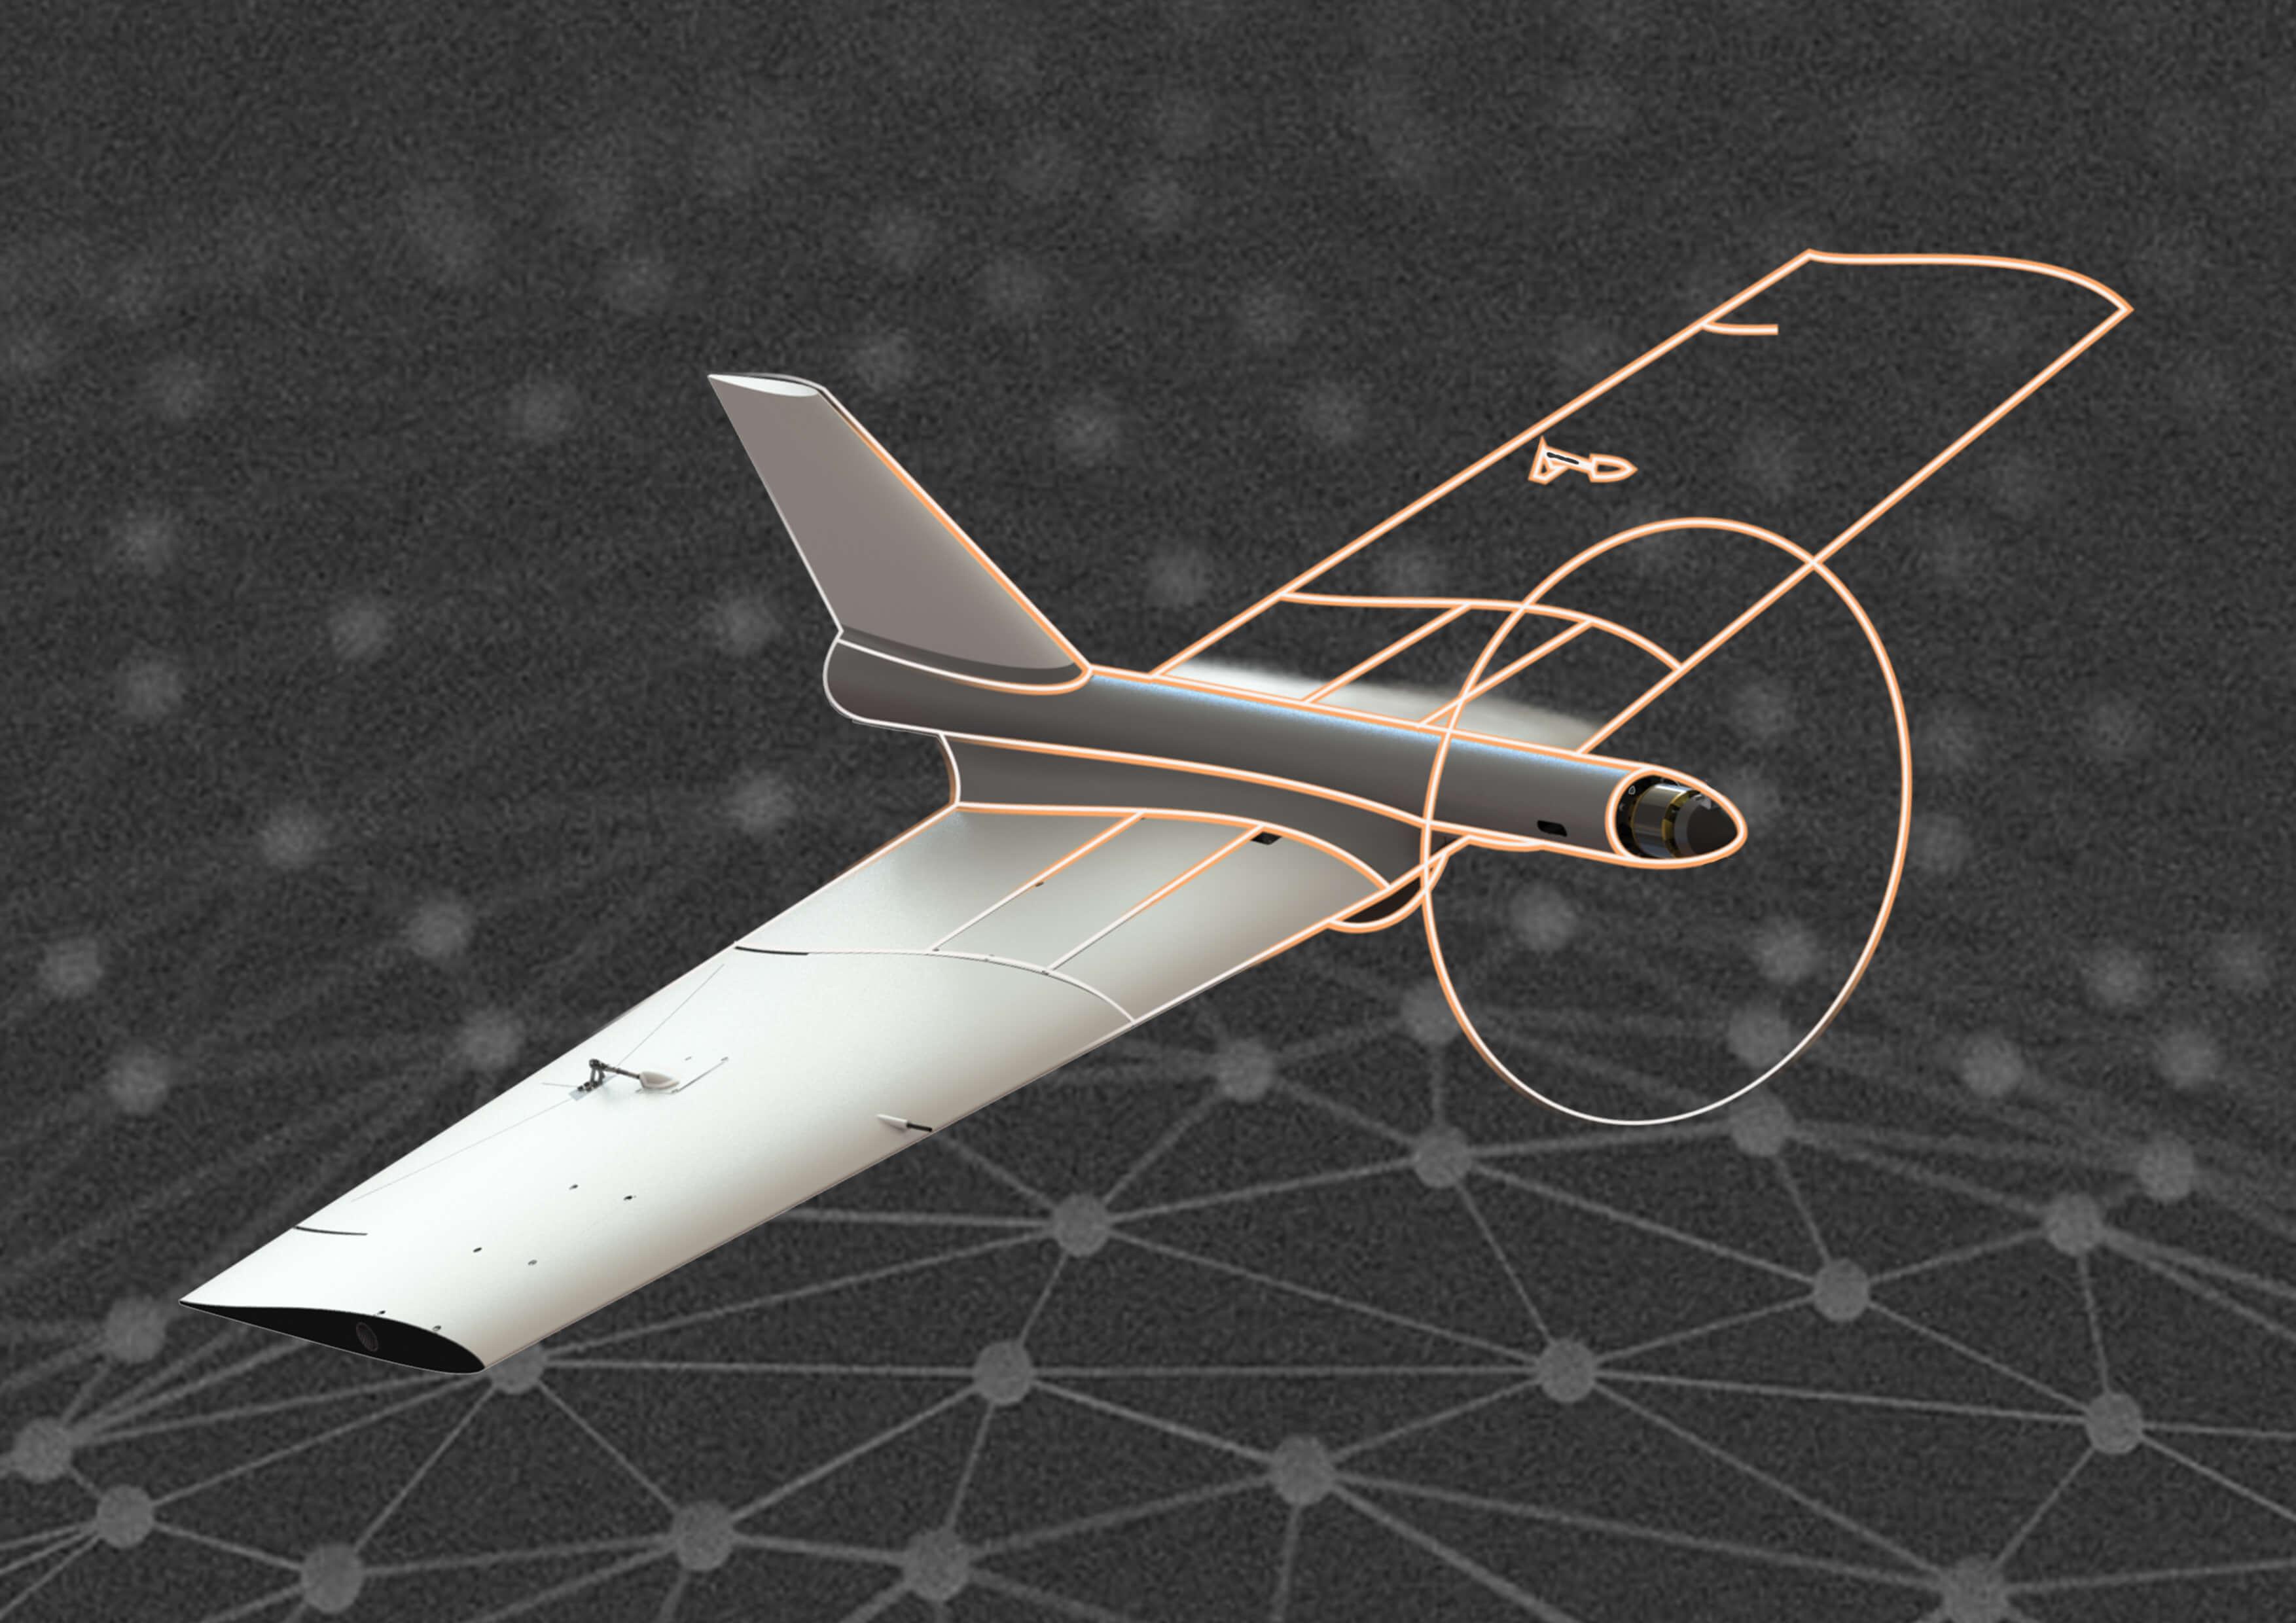 virtual BlackStart drone